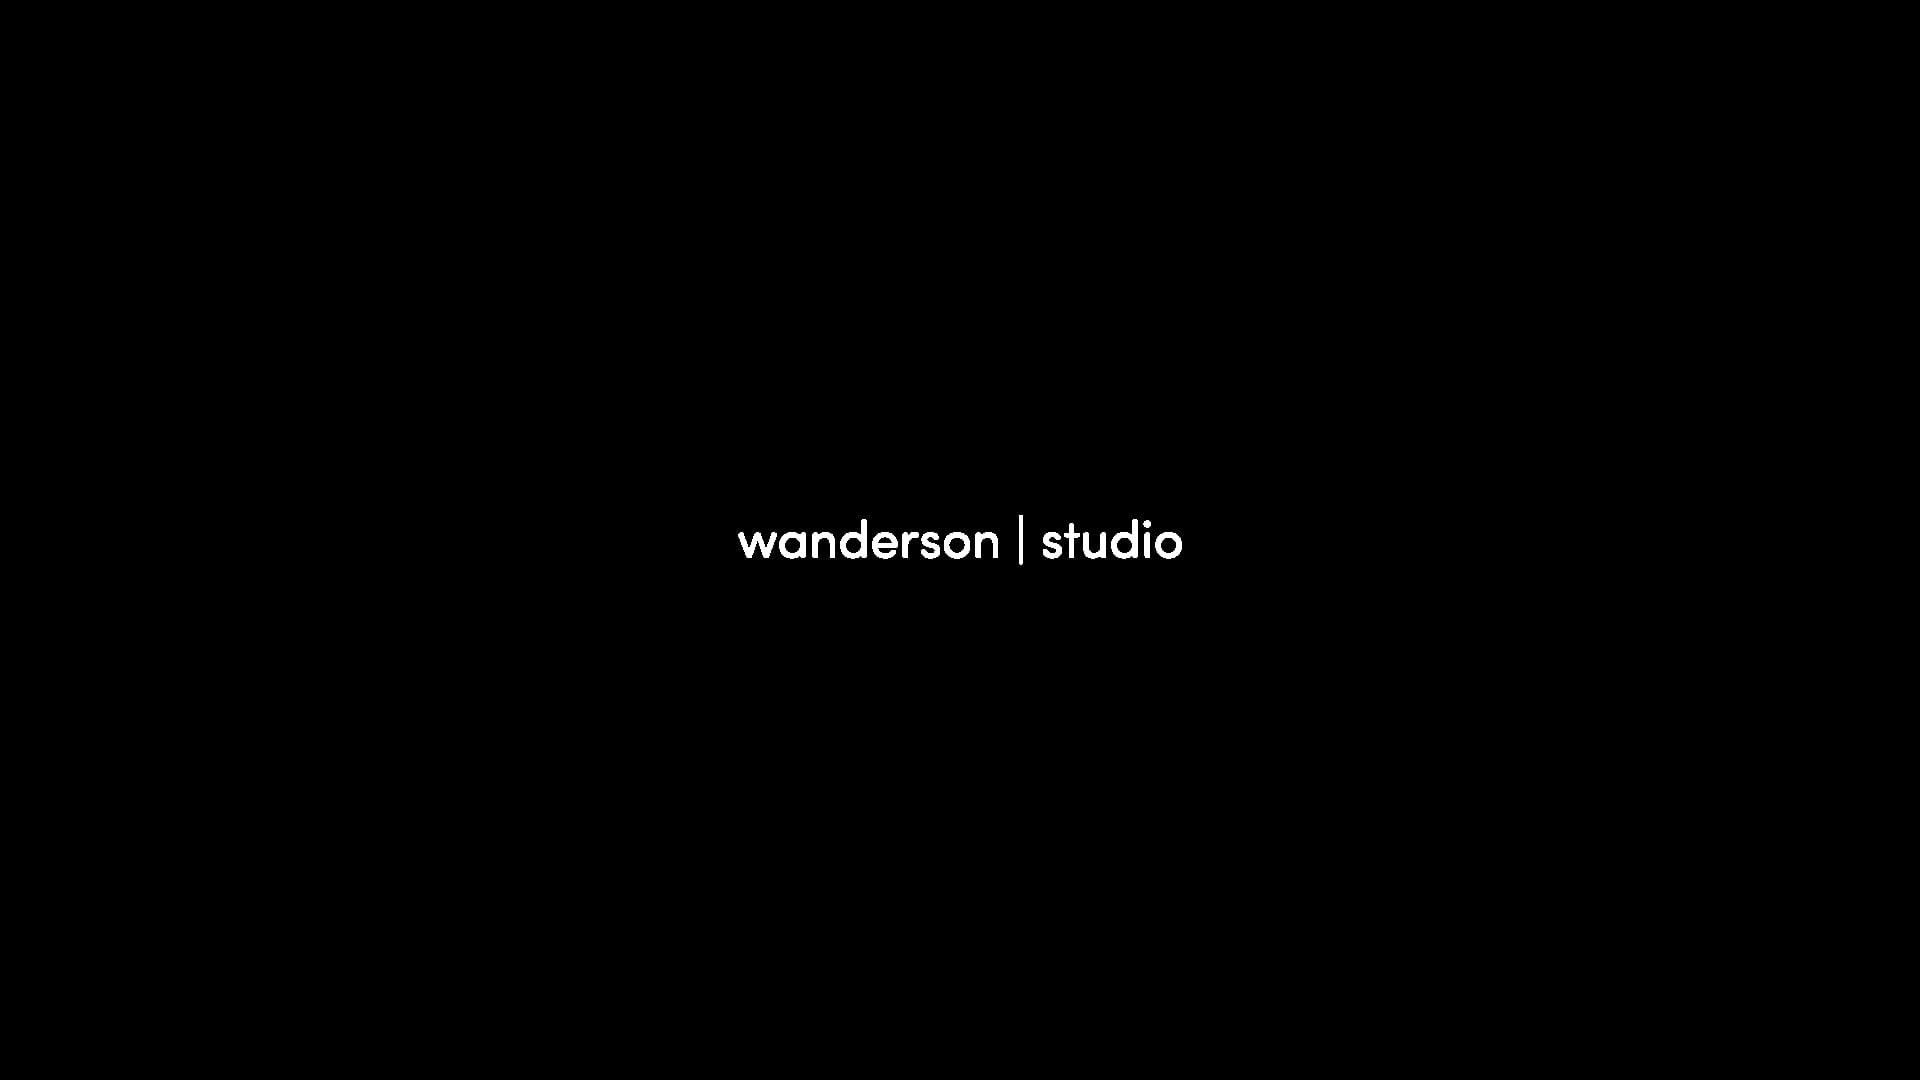 Wanderson Studio Showreel